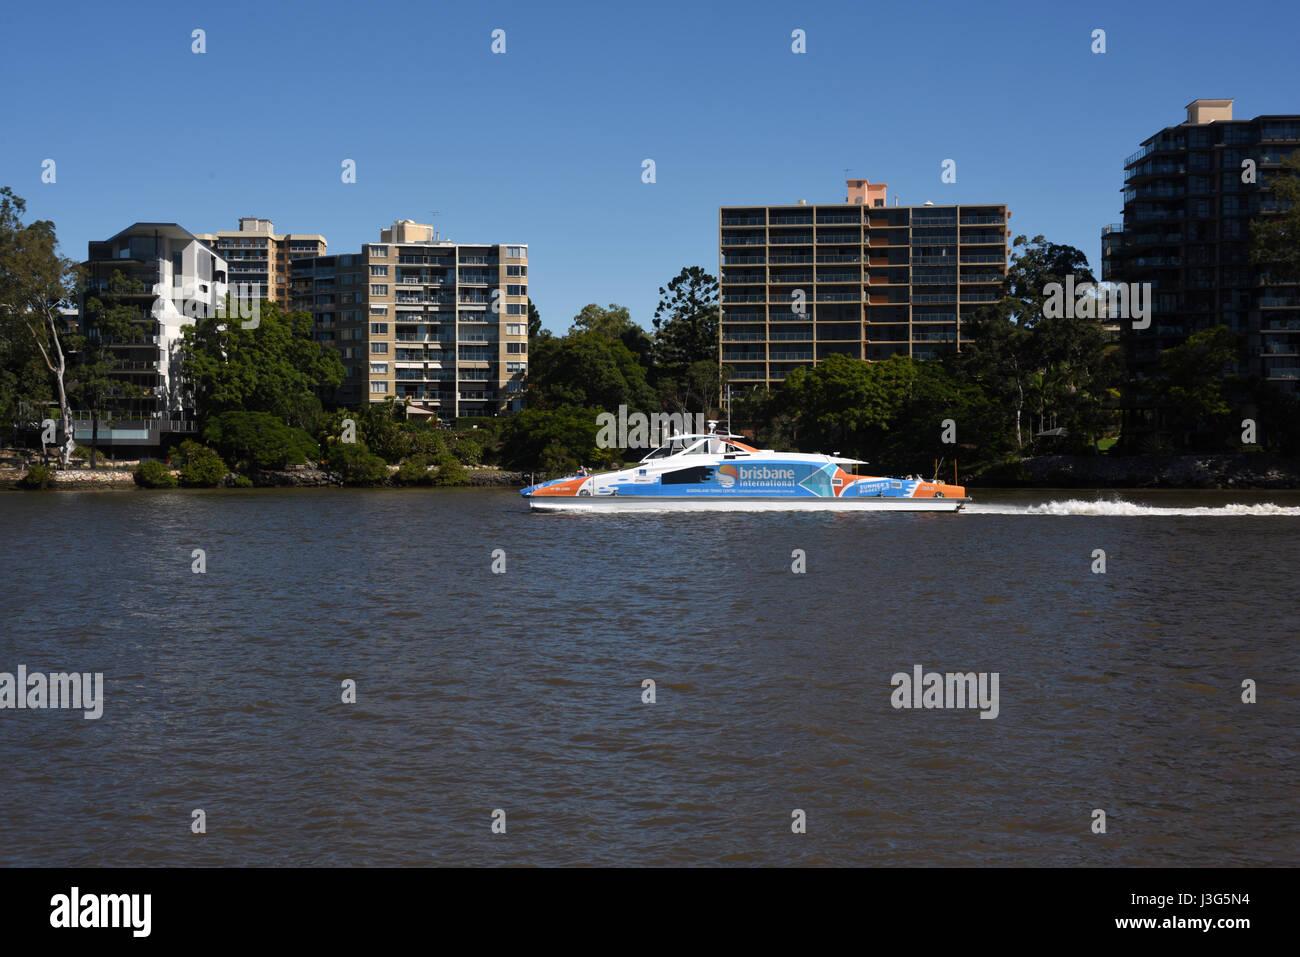 Brisbane, Australia: CityCat ferry on Brisbane River at St Lucia - Stock Image